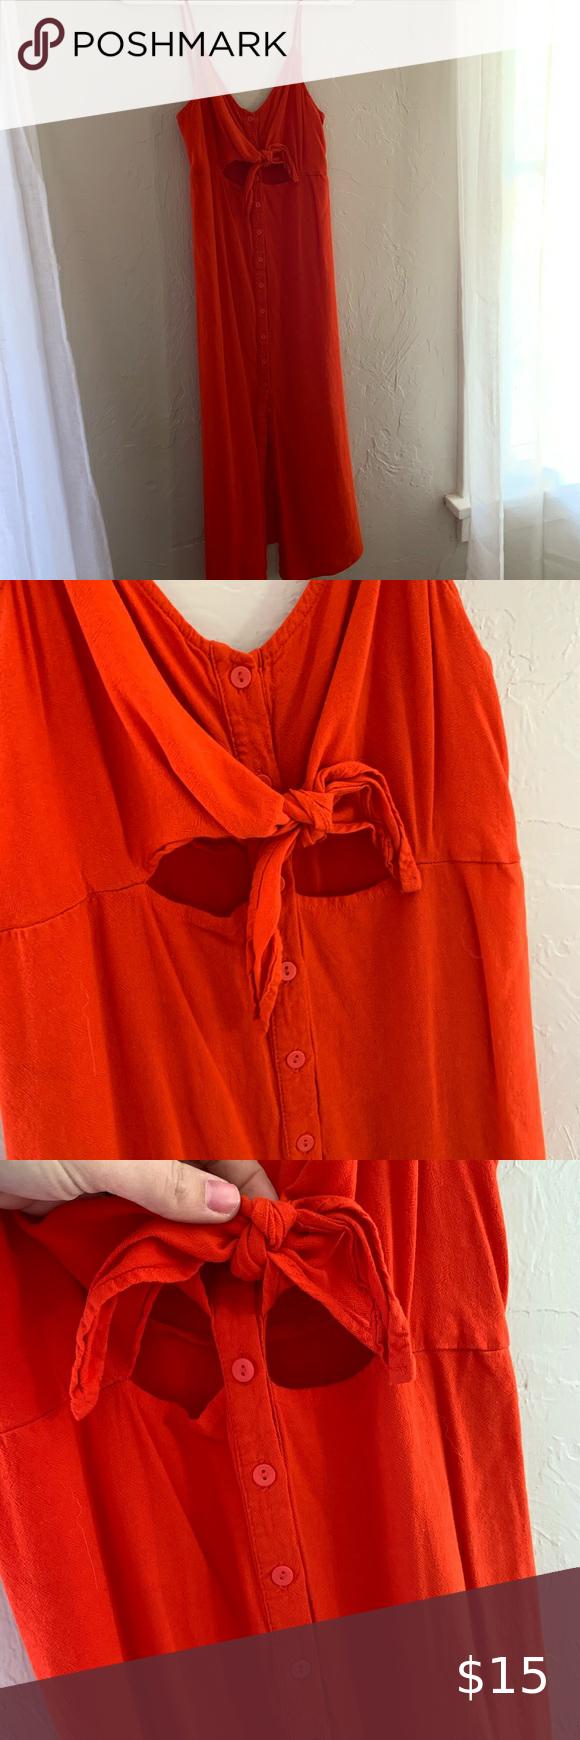 Orange Topshop Midi Dress Tank Top Shop Dress Tank Dress Tank Top Dress [ 1740 x 580 Pixel ]